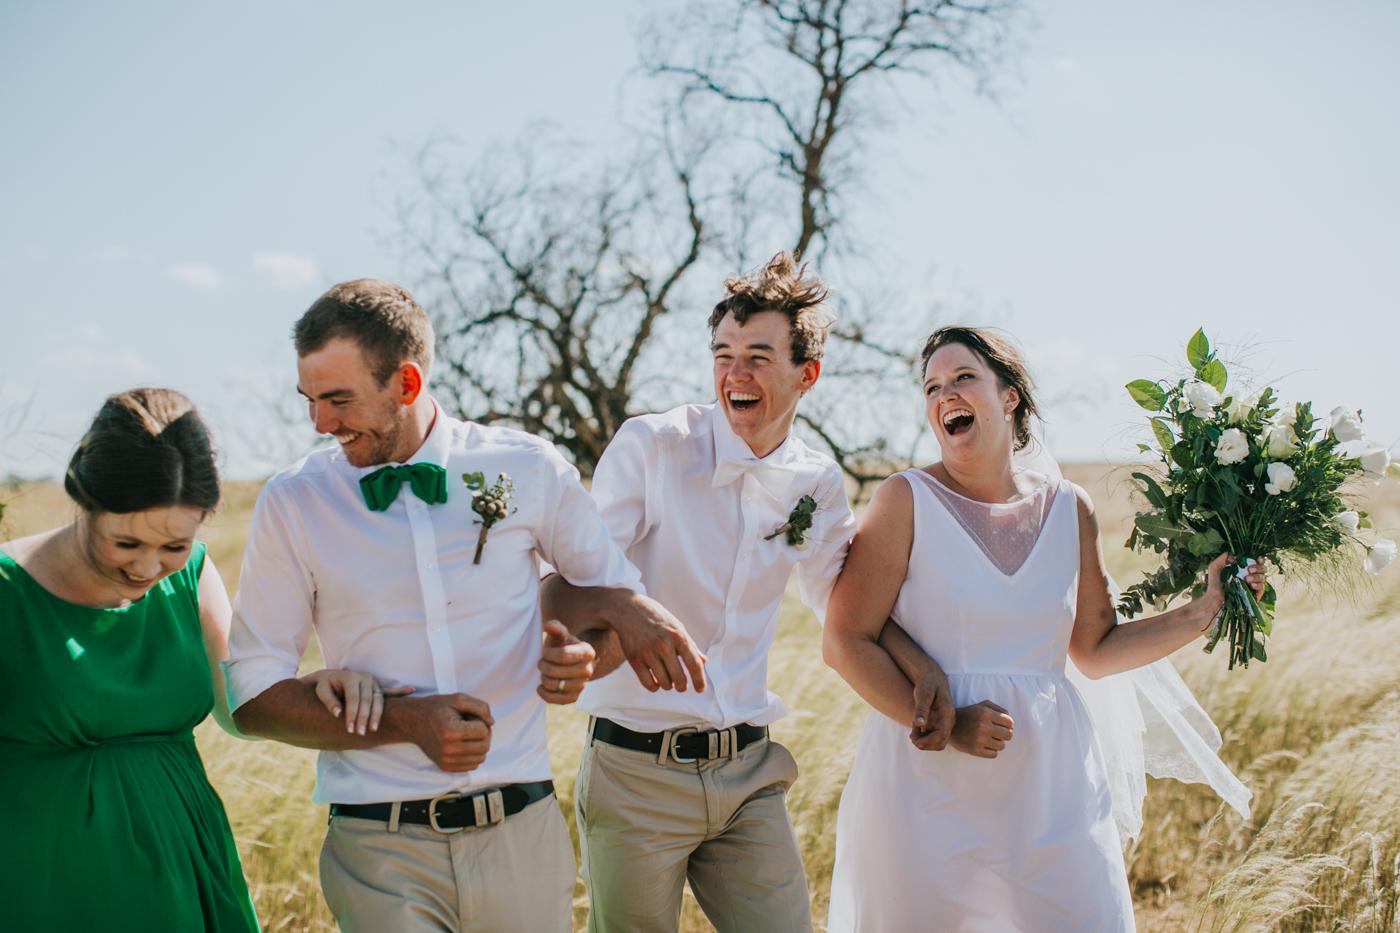 Nicolle & Jacob - Dubbo Wedding - Country Australia - Samantha Heather Photography-168.jpg